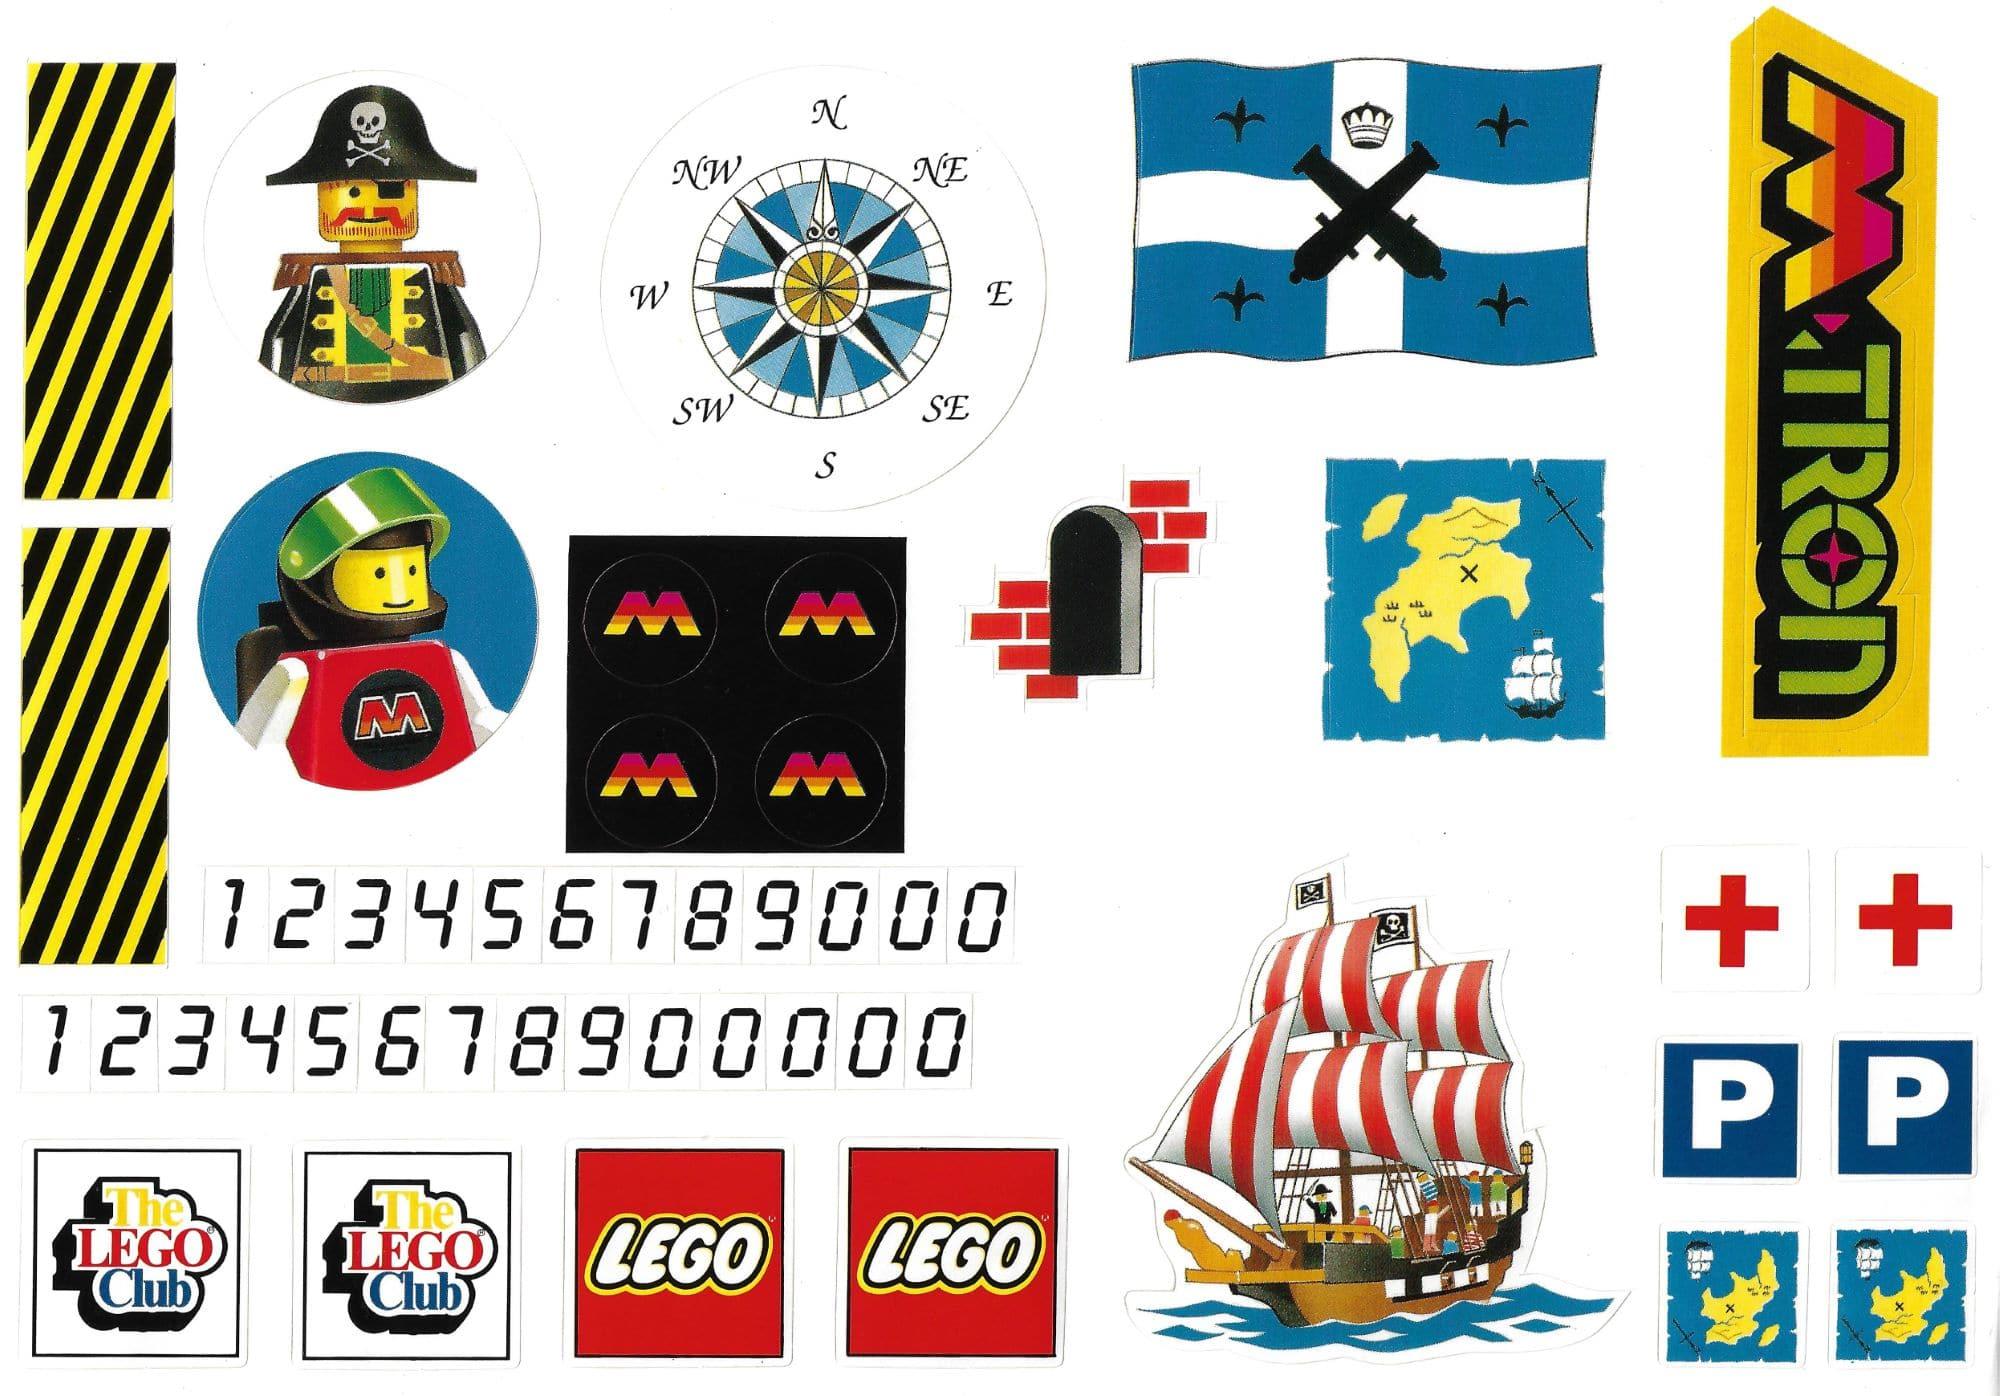 LEGO M Tron Pirates Sticker LEGO Club